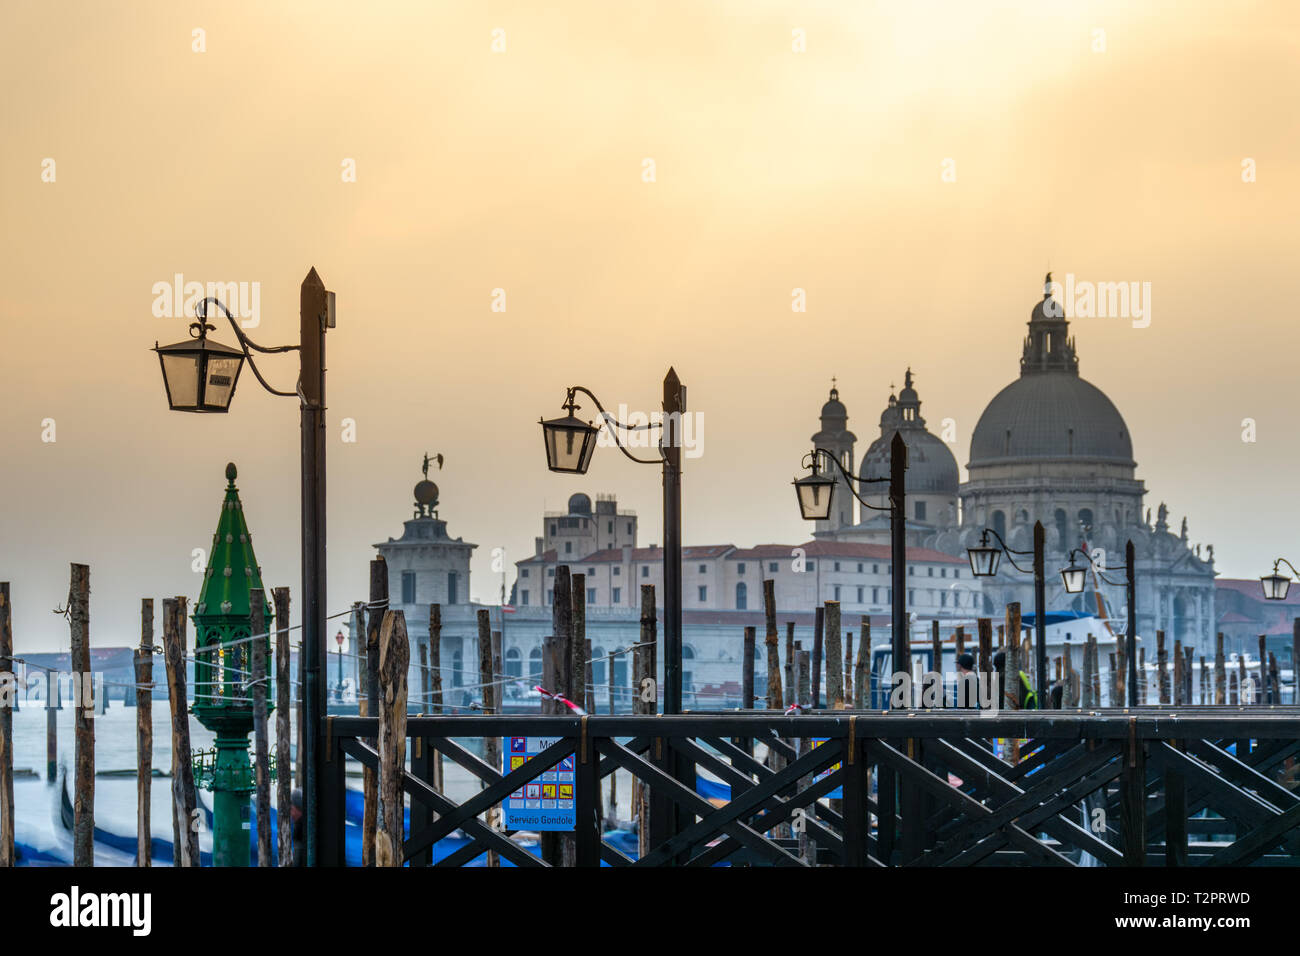 Alte Kathedrale von Santa Maria della Salute in Venedig, Italien Stockfoto